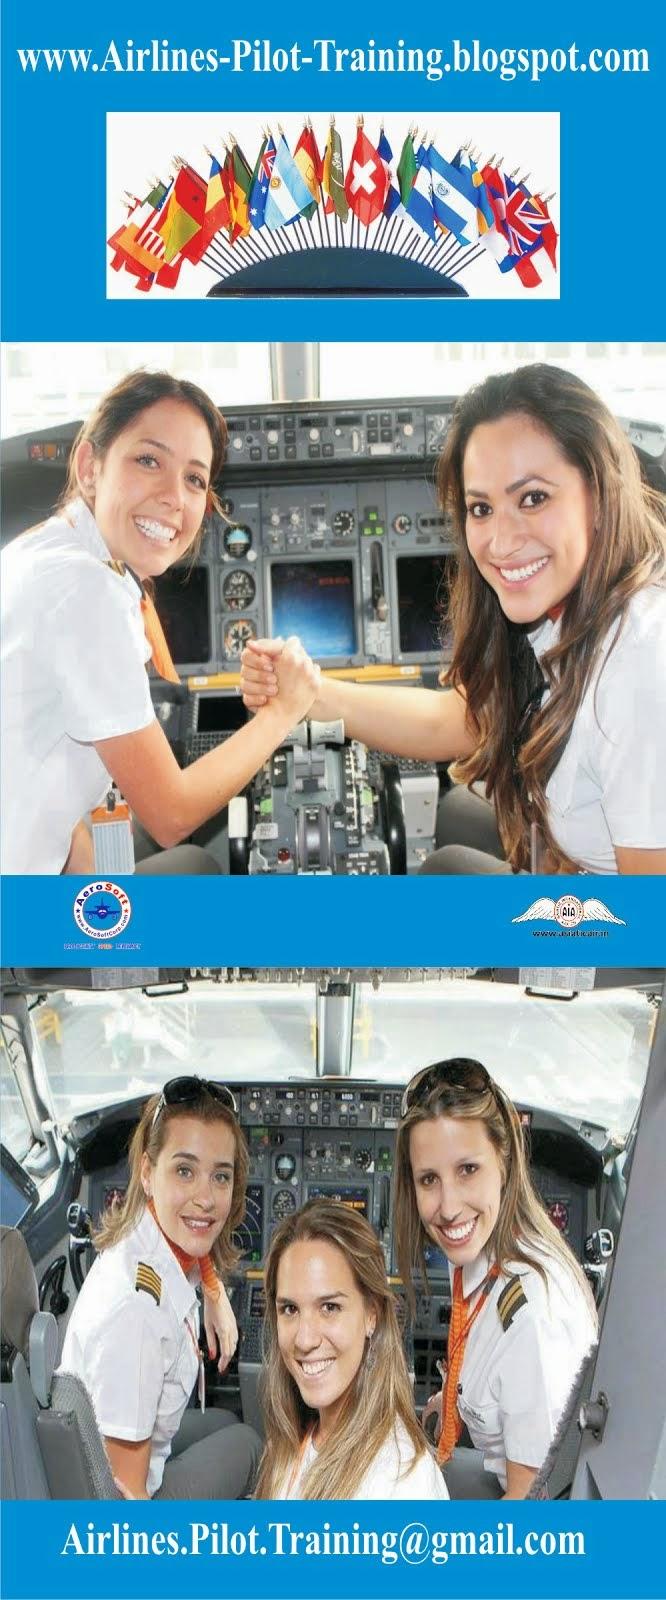 www.International-Airline-Pilot-Training.blogspot.com